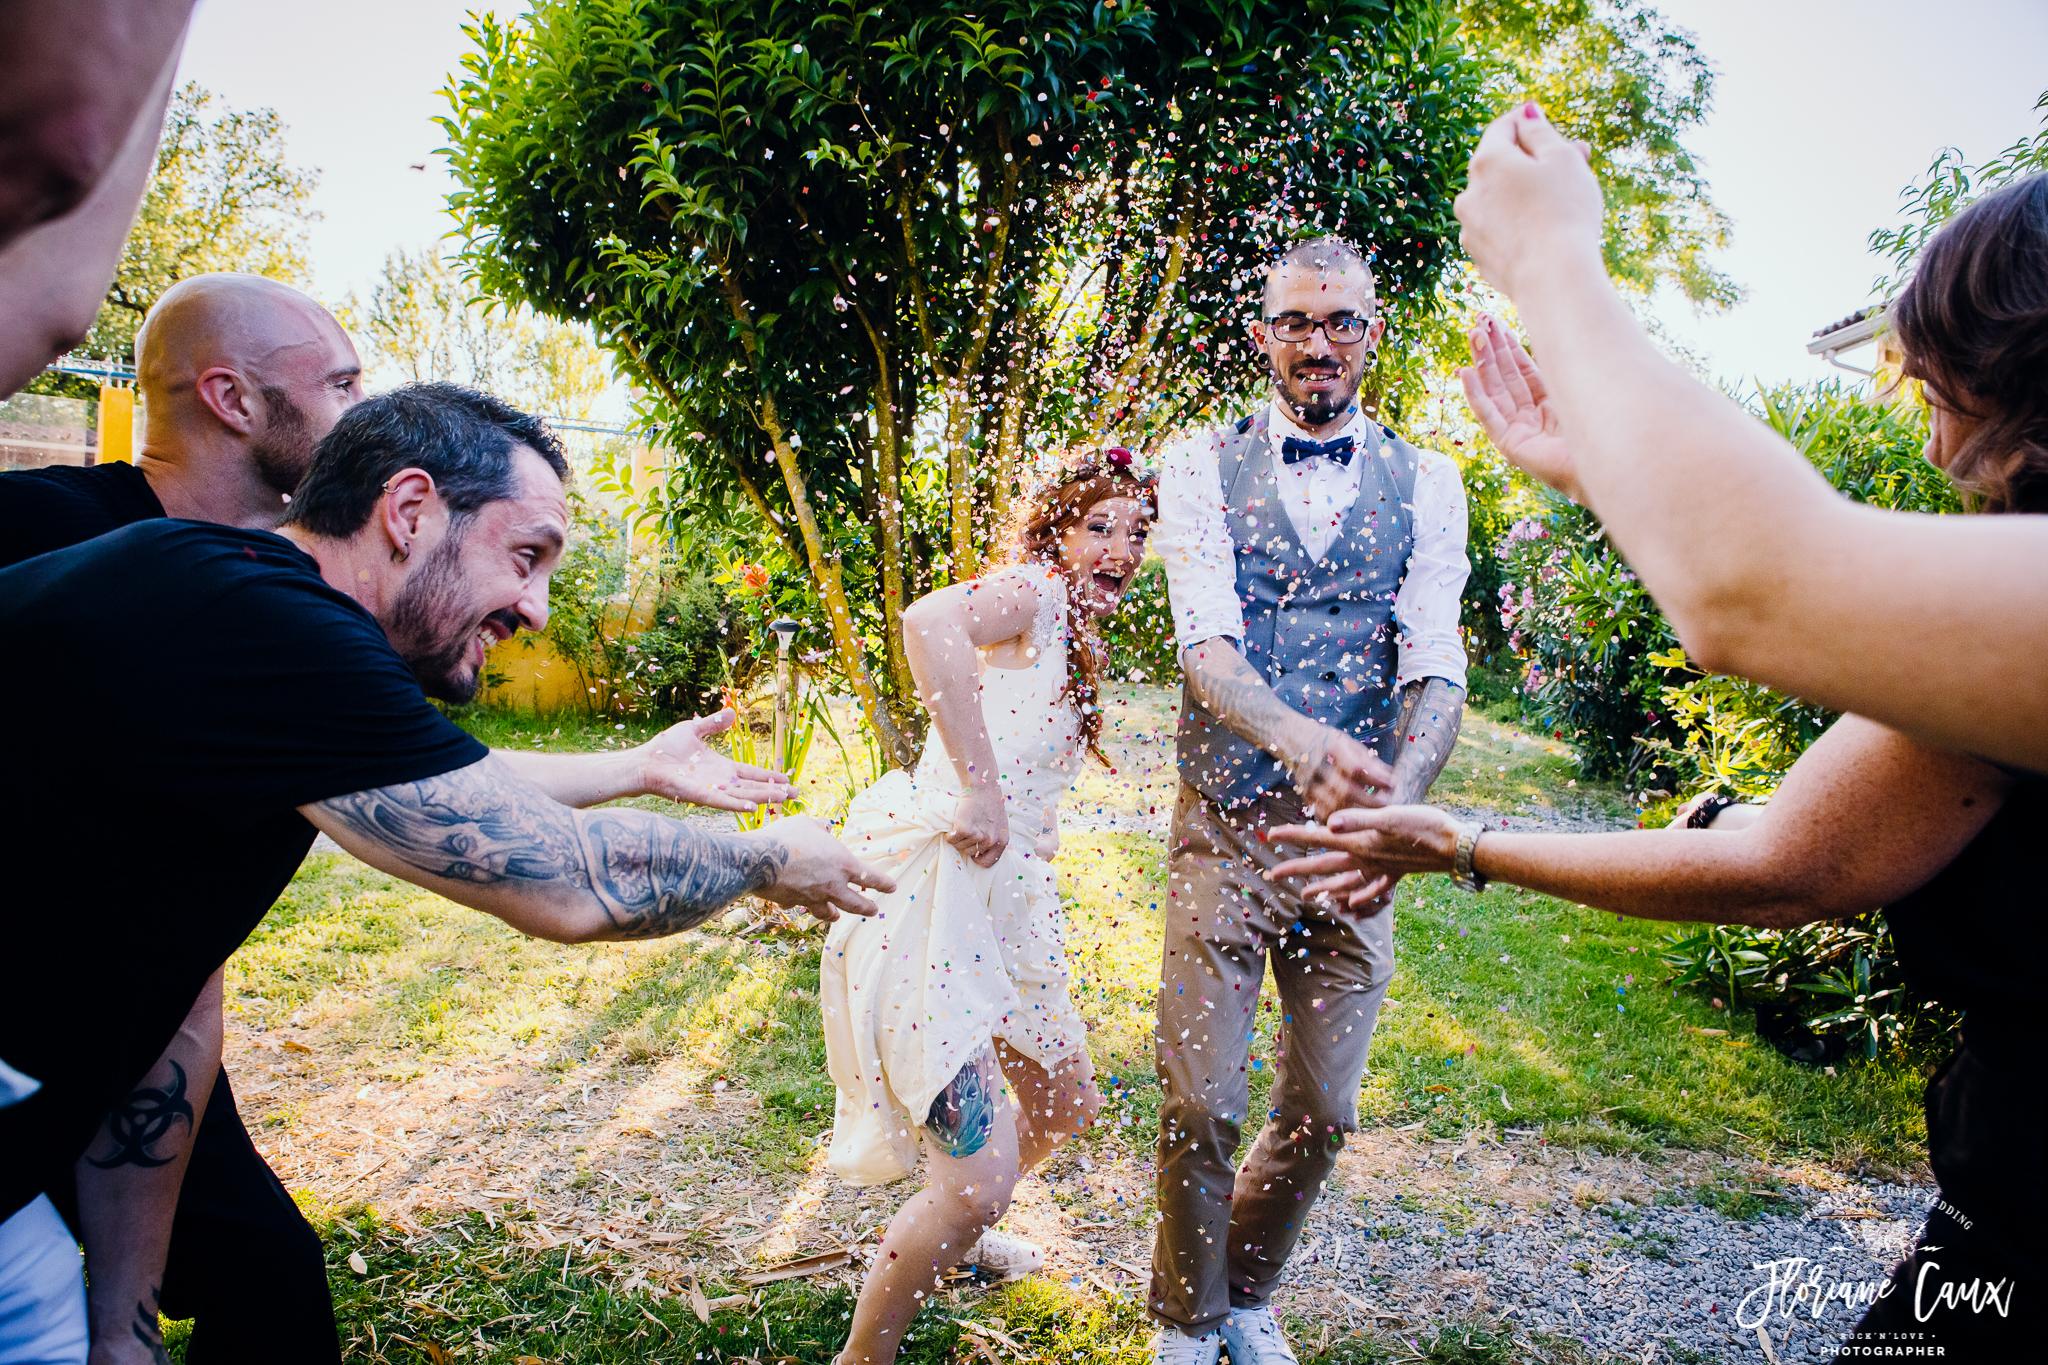 photographe-mariage-toulouse-rocknroll-maries-tatoues-floriane-caux-107